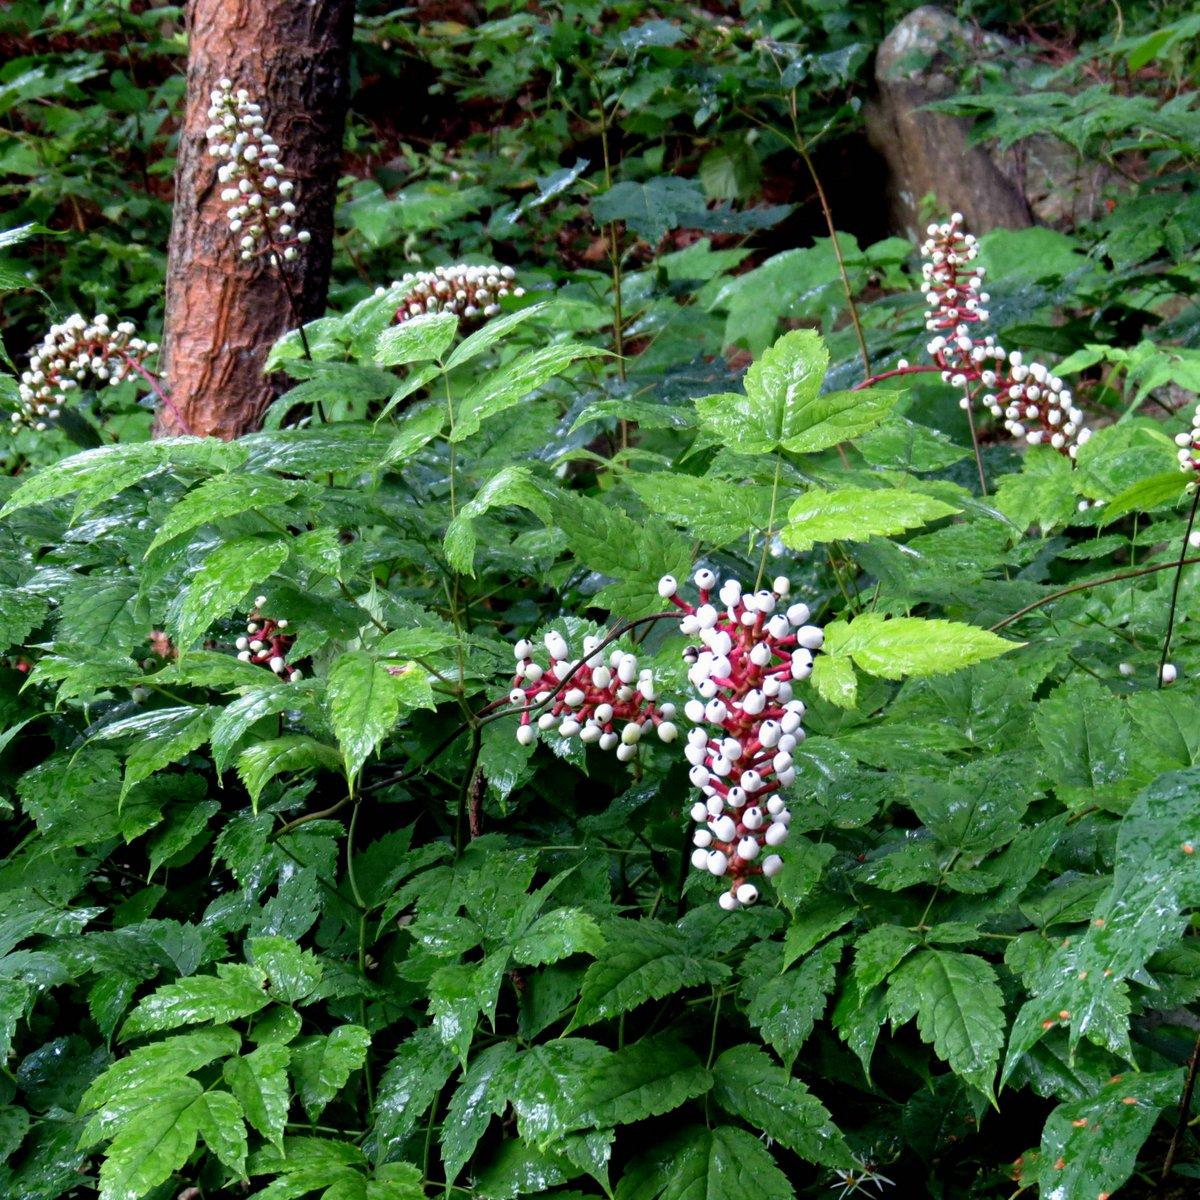 13. White Baneberry Plants